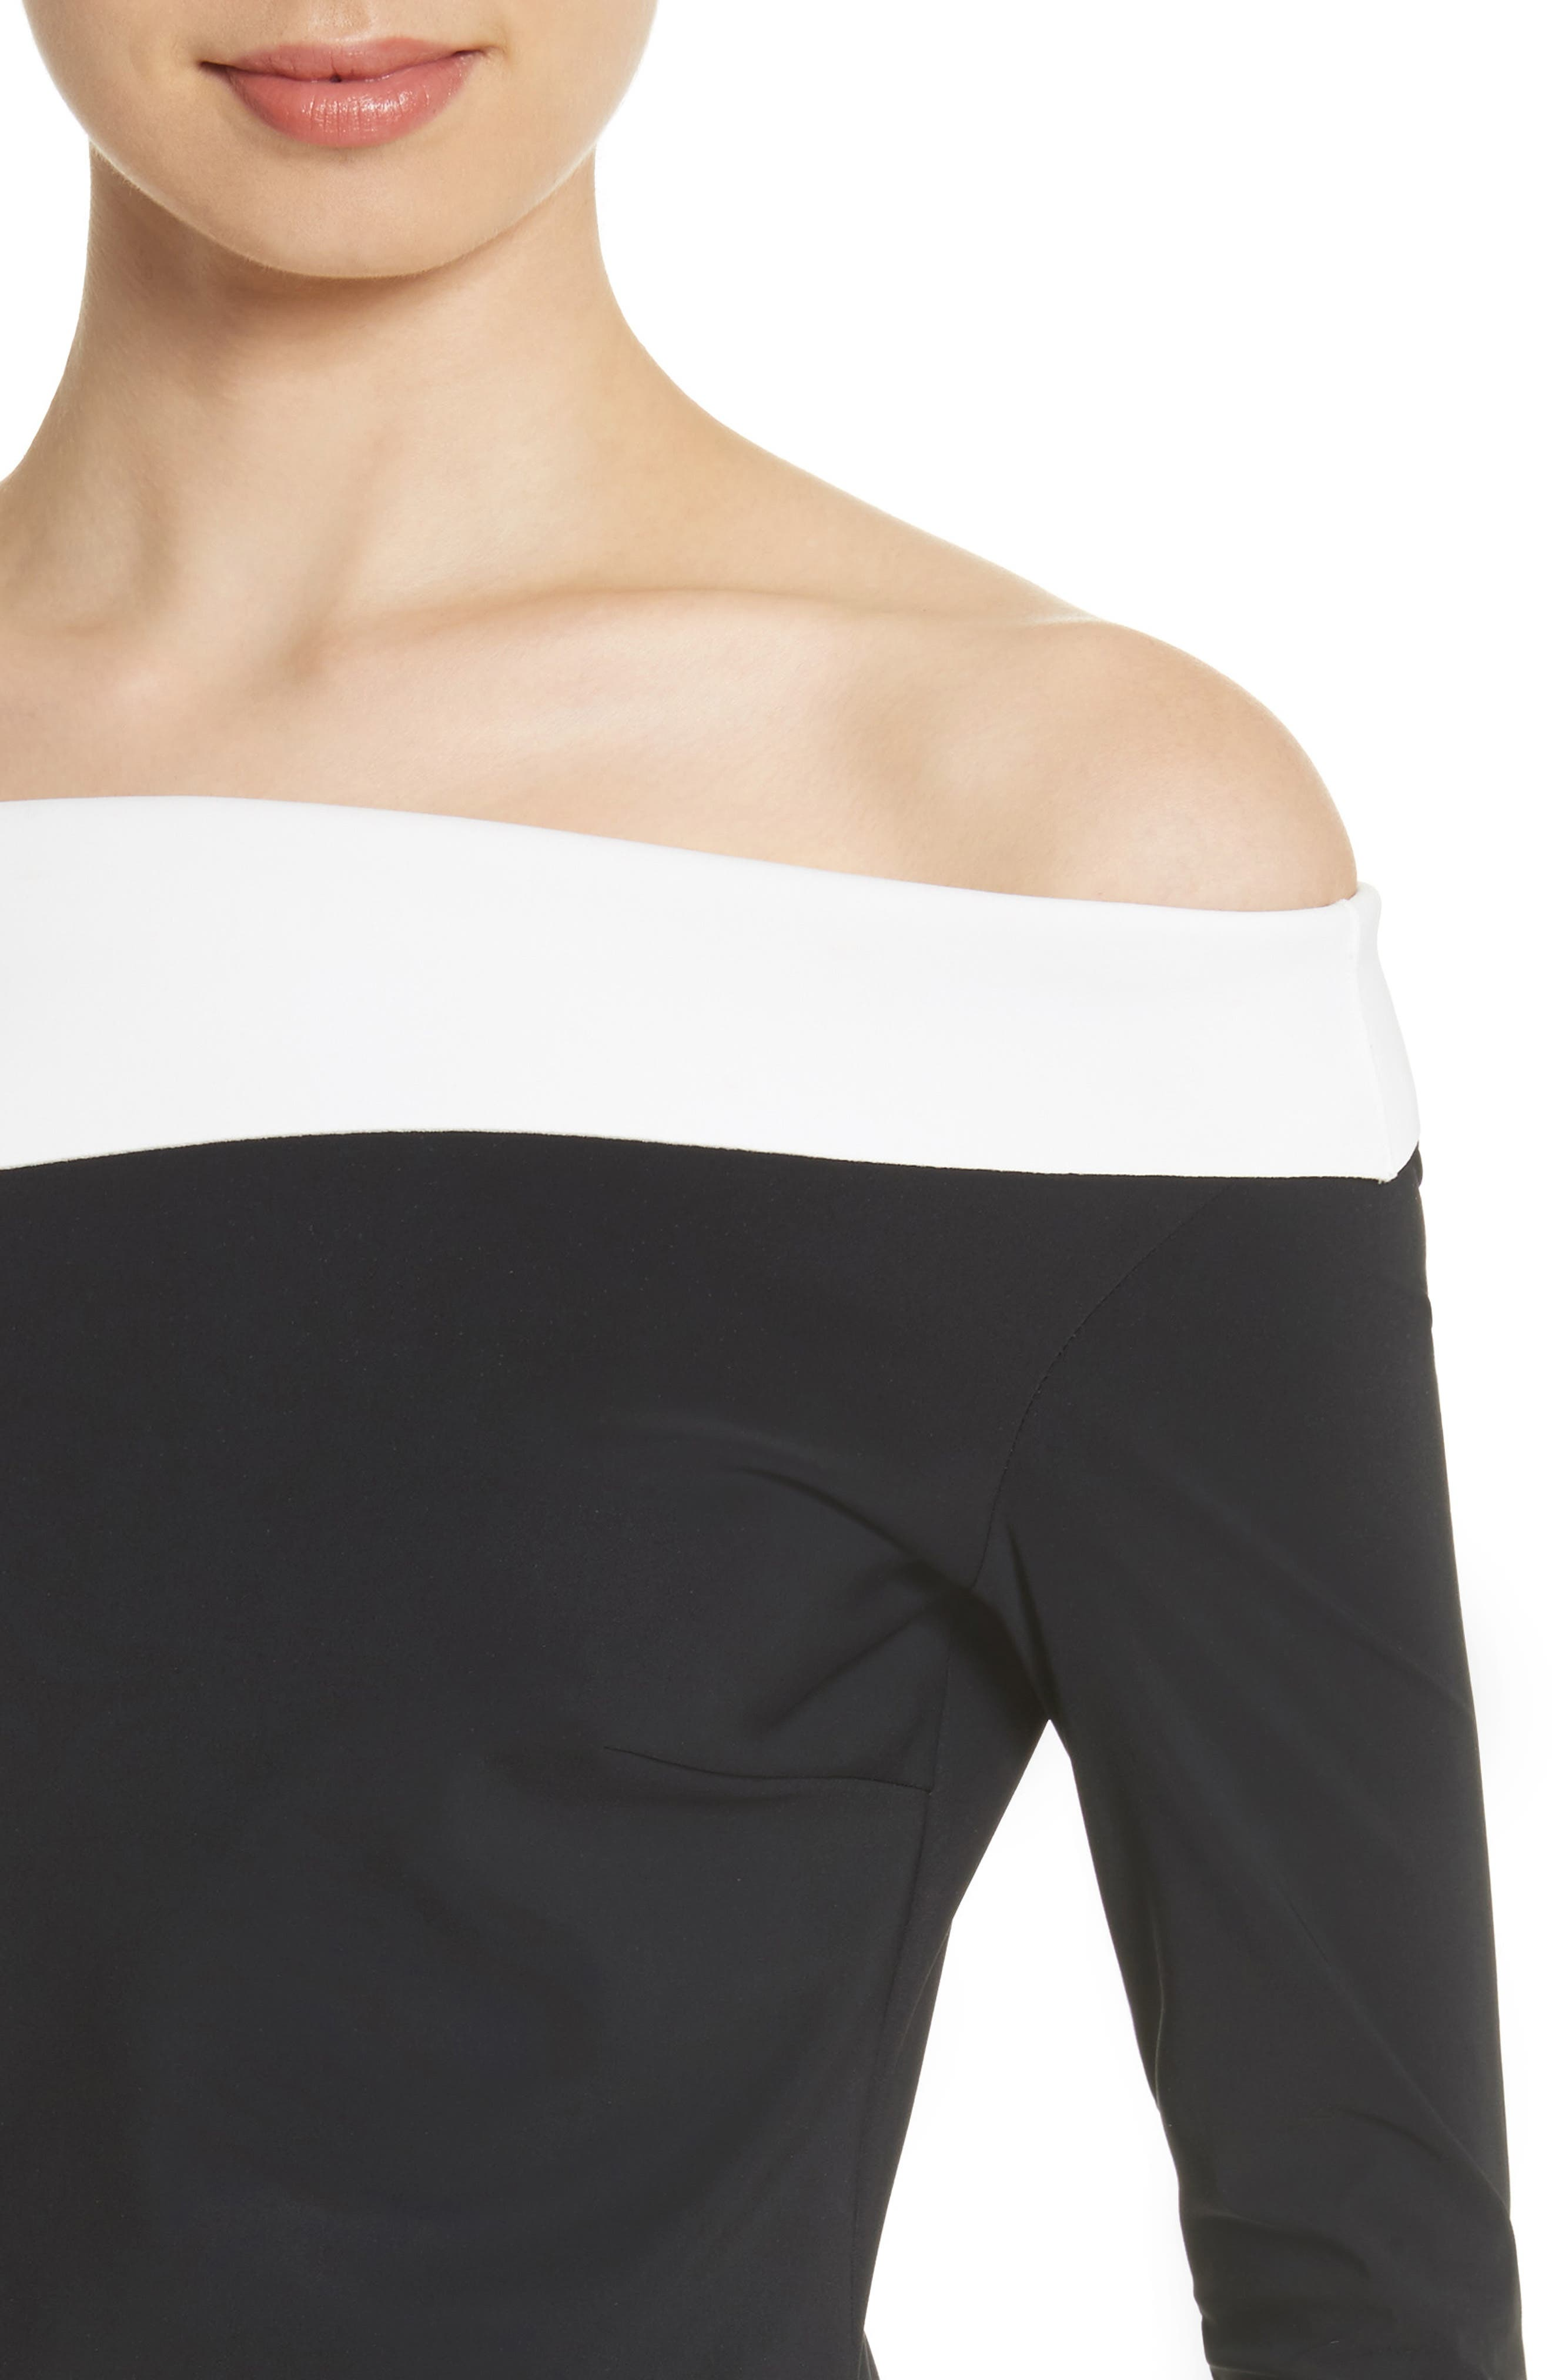 Tae Bicolor Off the Shoulder Gown,                             Alternate thumbnail 4, color,                             Black/ White